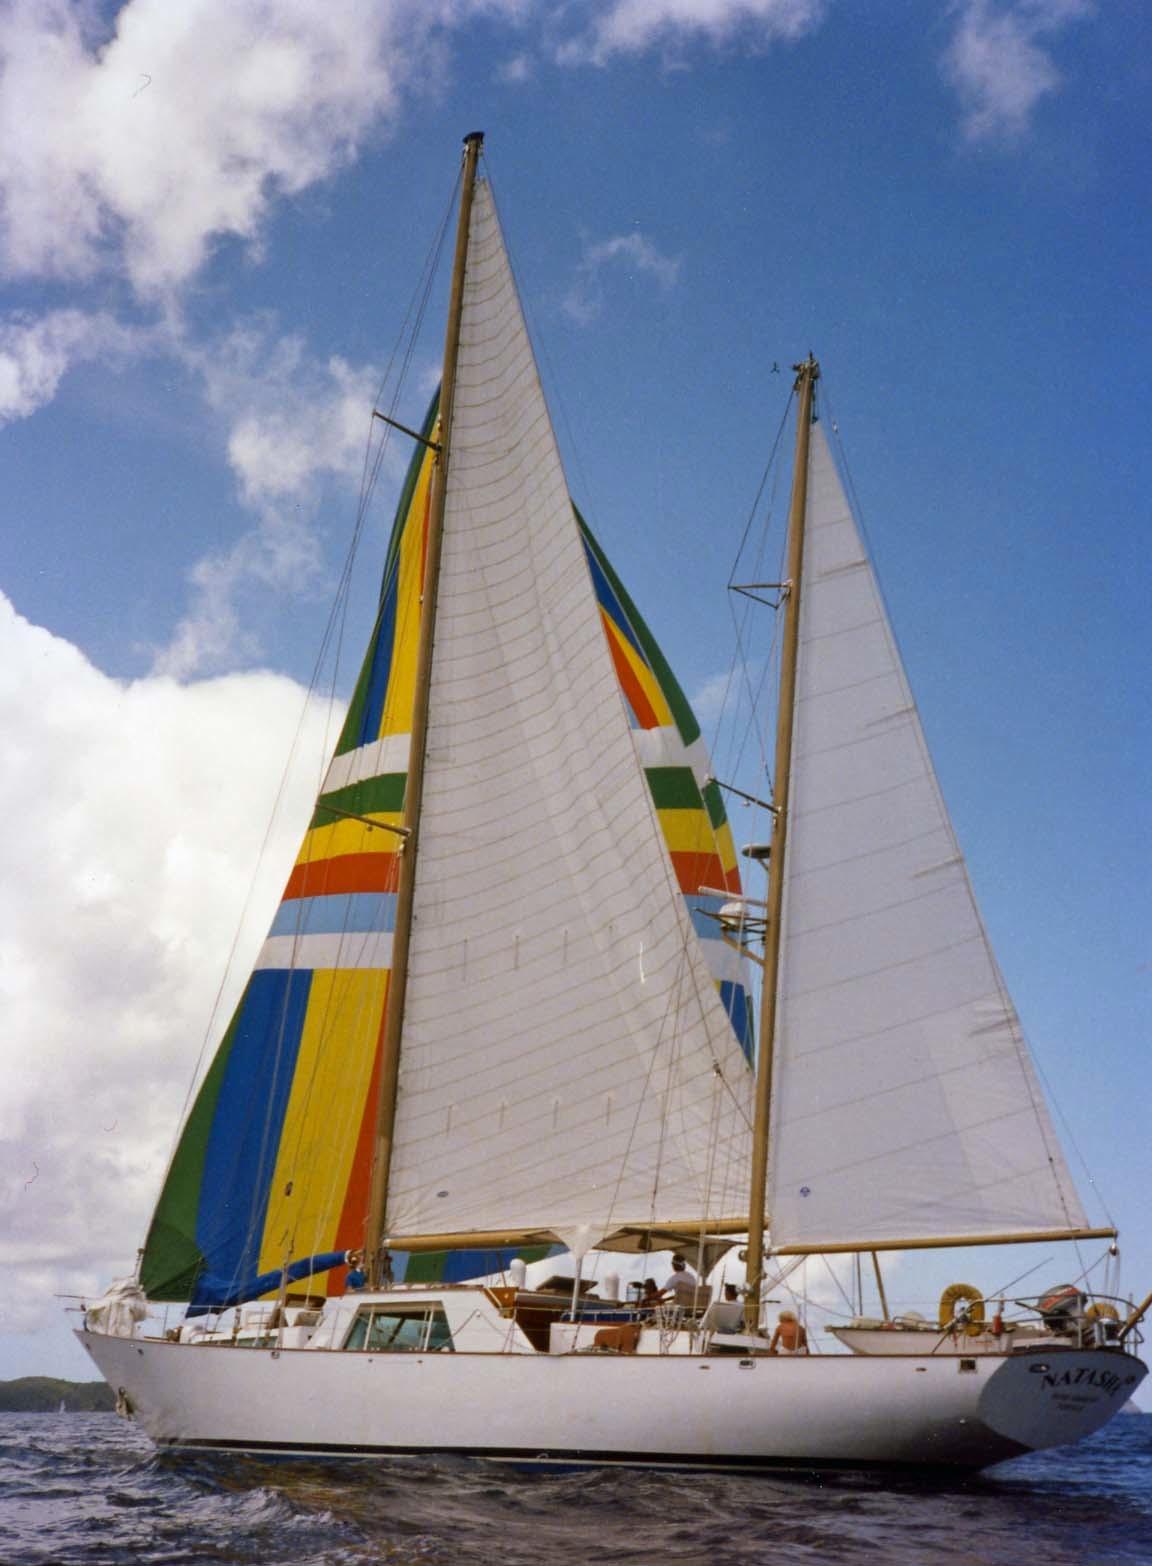 The Natasha trip to Virgin Islands aboard the Natasha, March 18-25, 1989